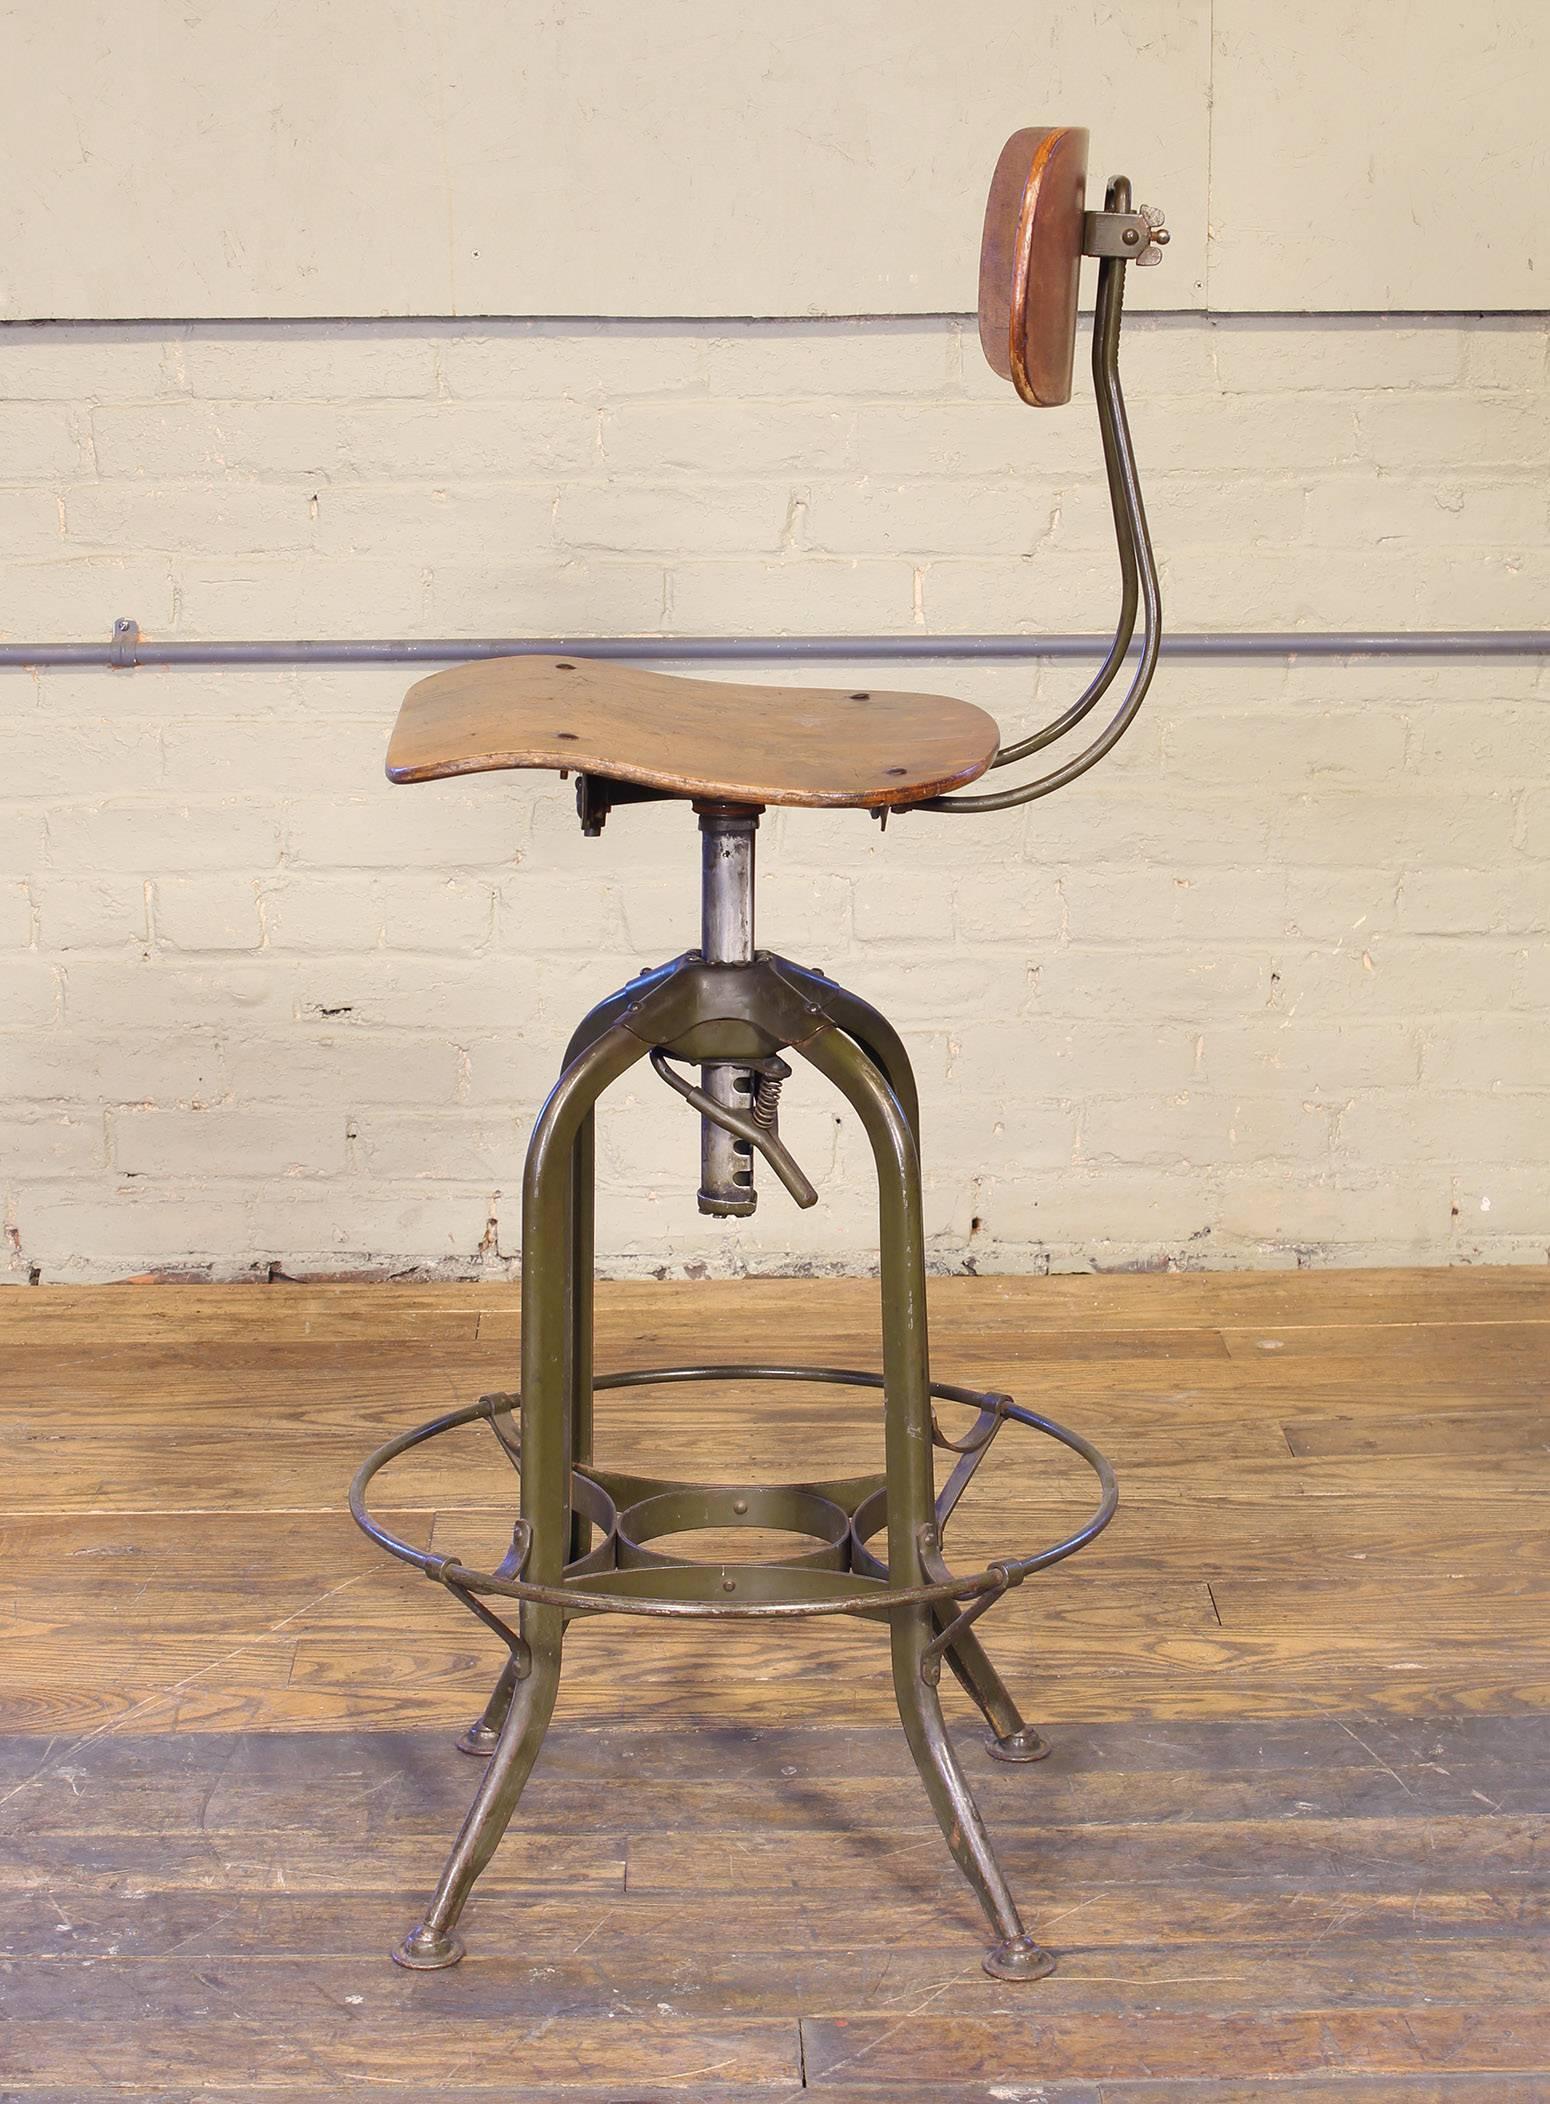 Exceptionnel Original Vintage Adjustable Toledo Bar Stool Drafting Chair For Sale 3